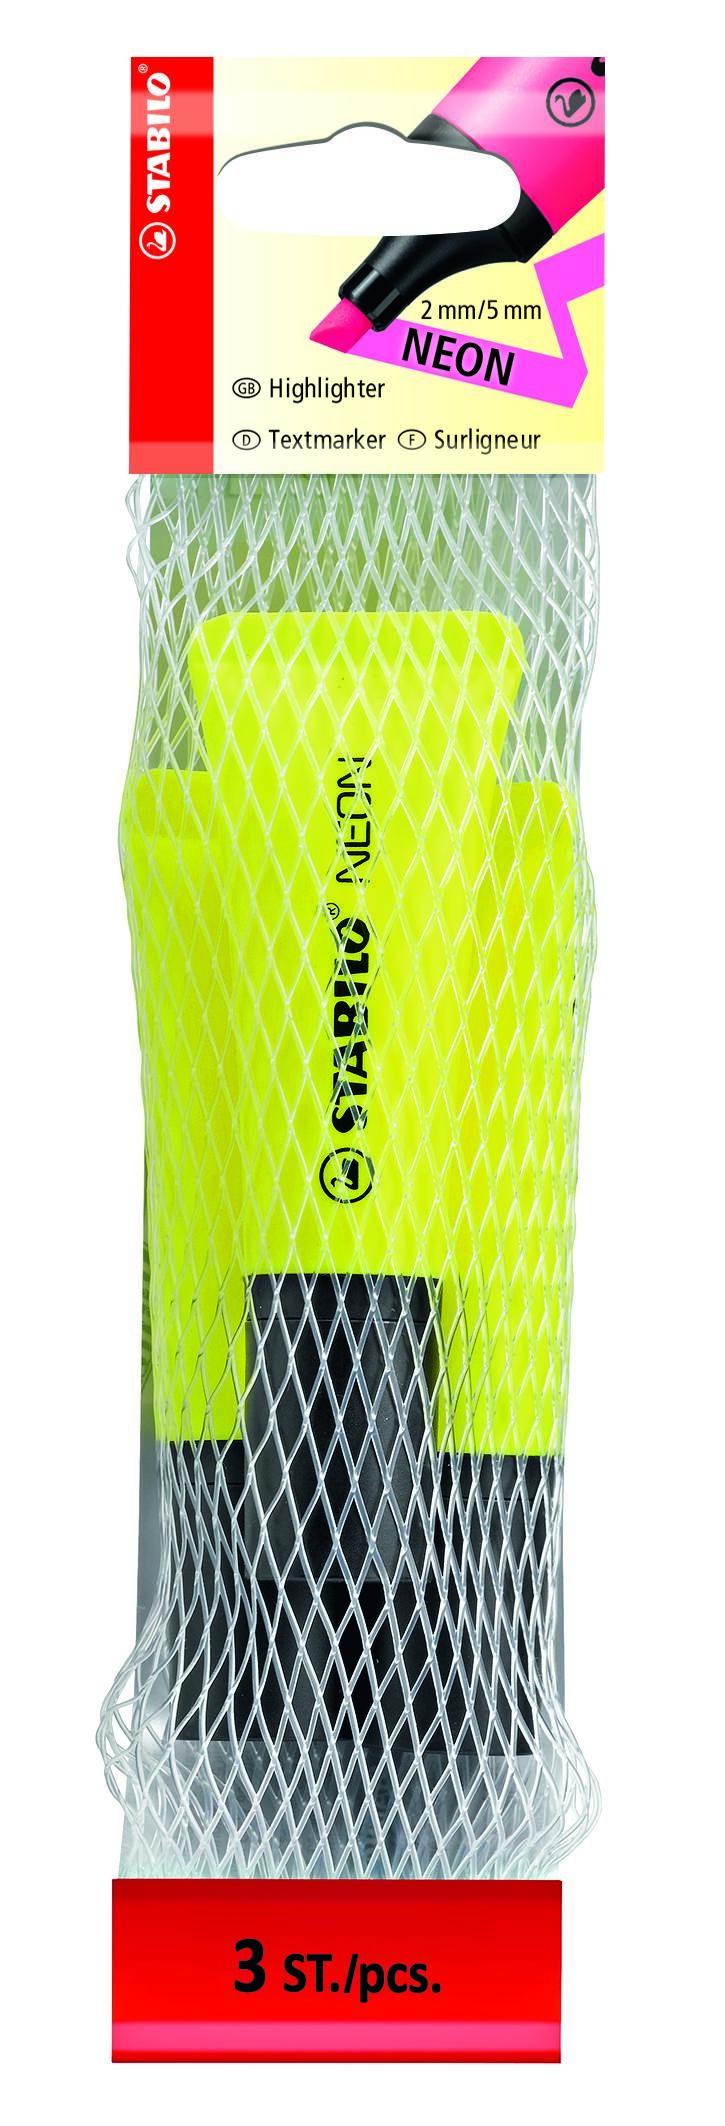 STABILO NEON - Filet 3 surligneurs - jaune